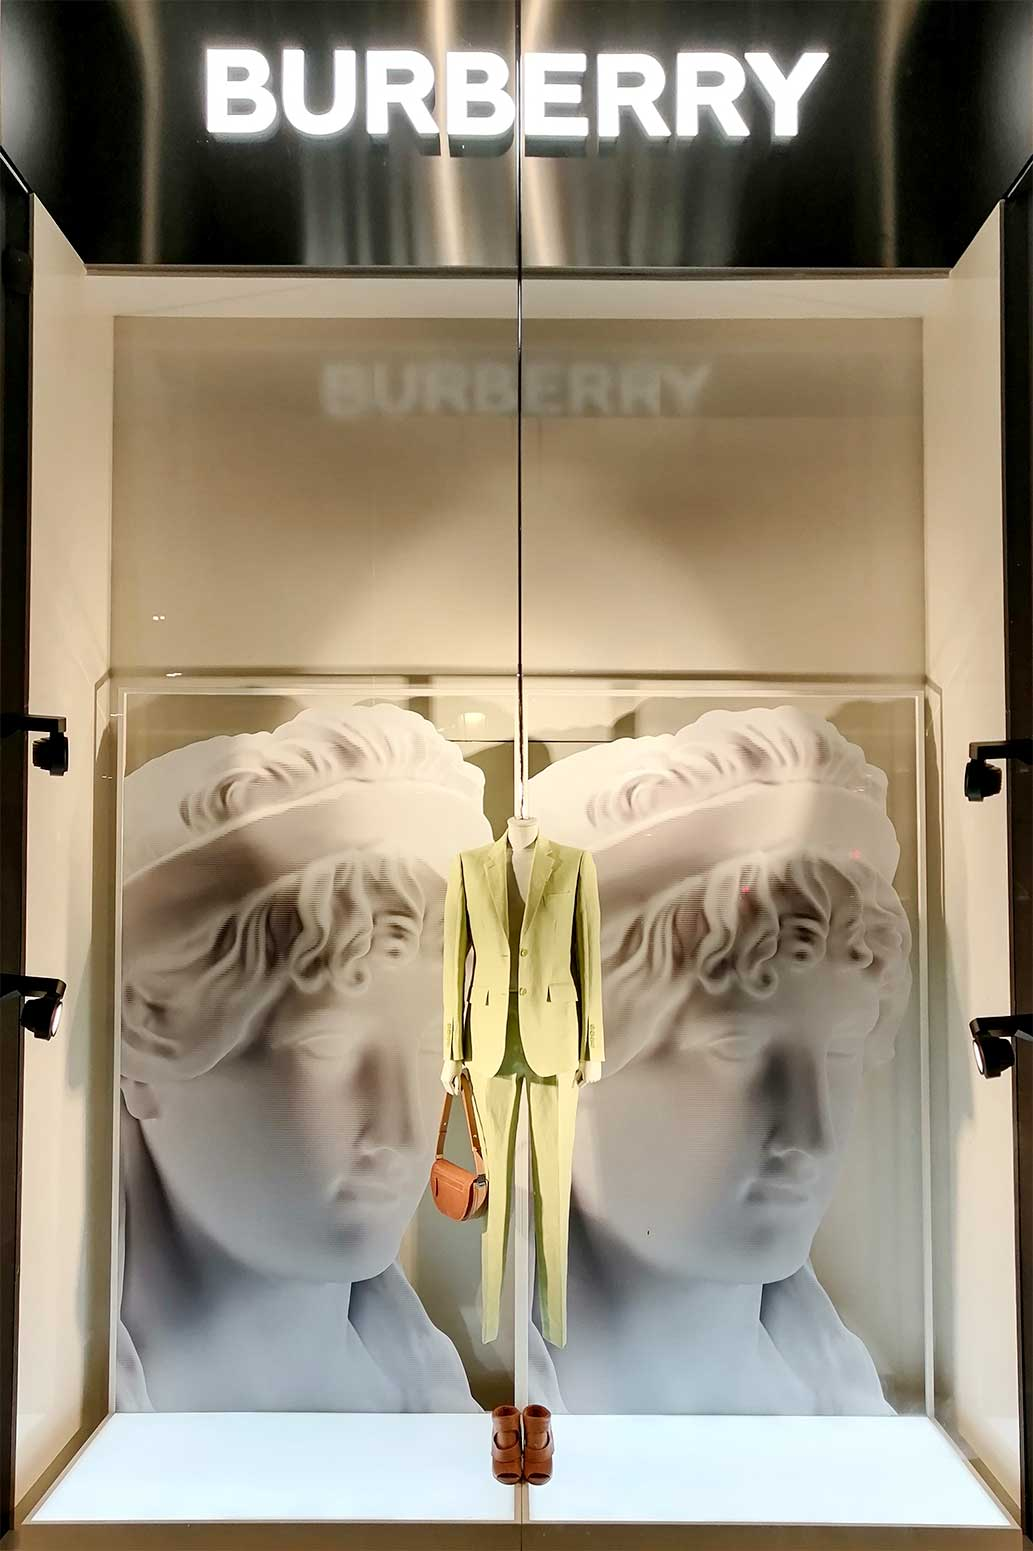 impresion-digital-corporeos-para-escaparates-burberry